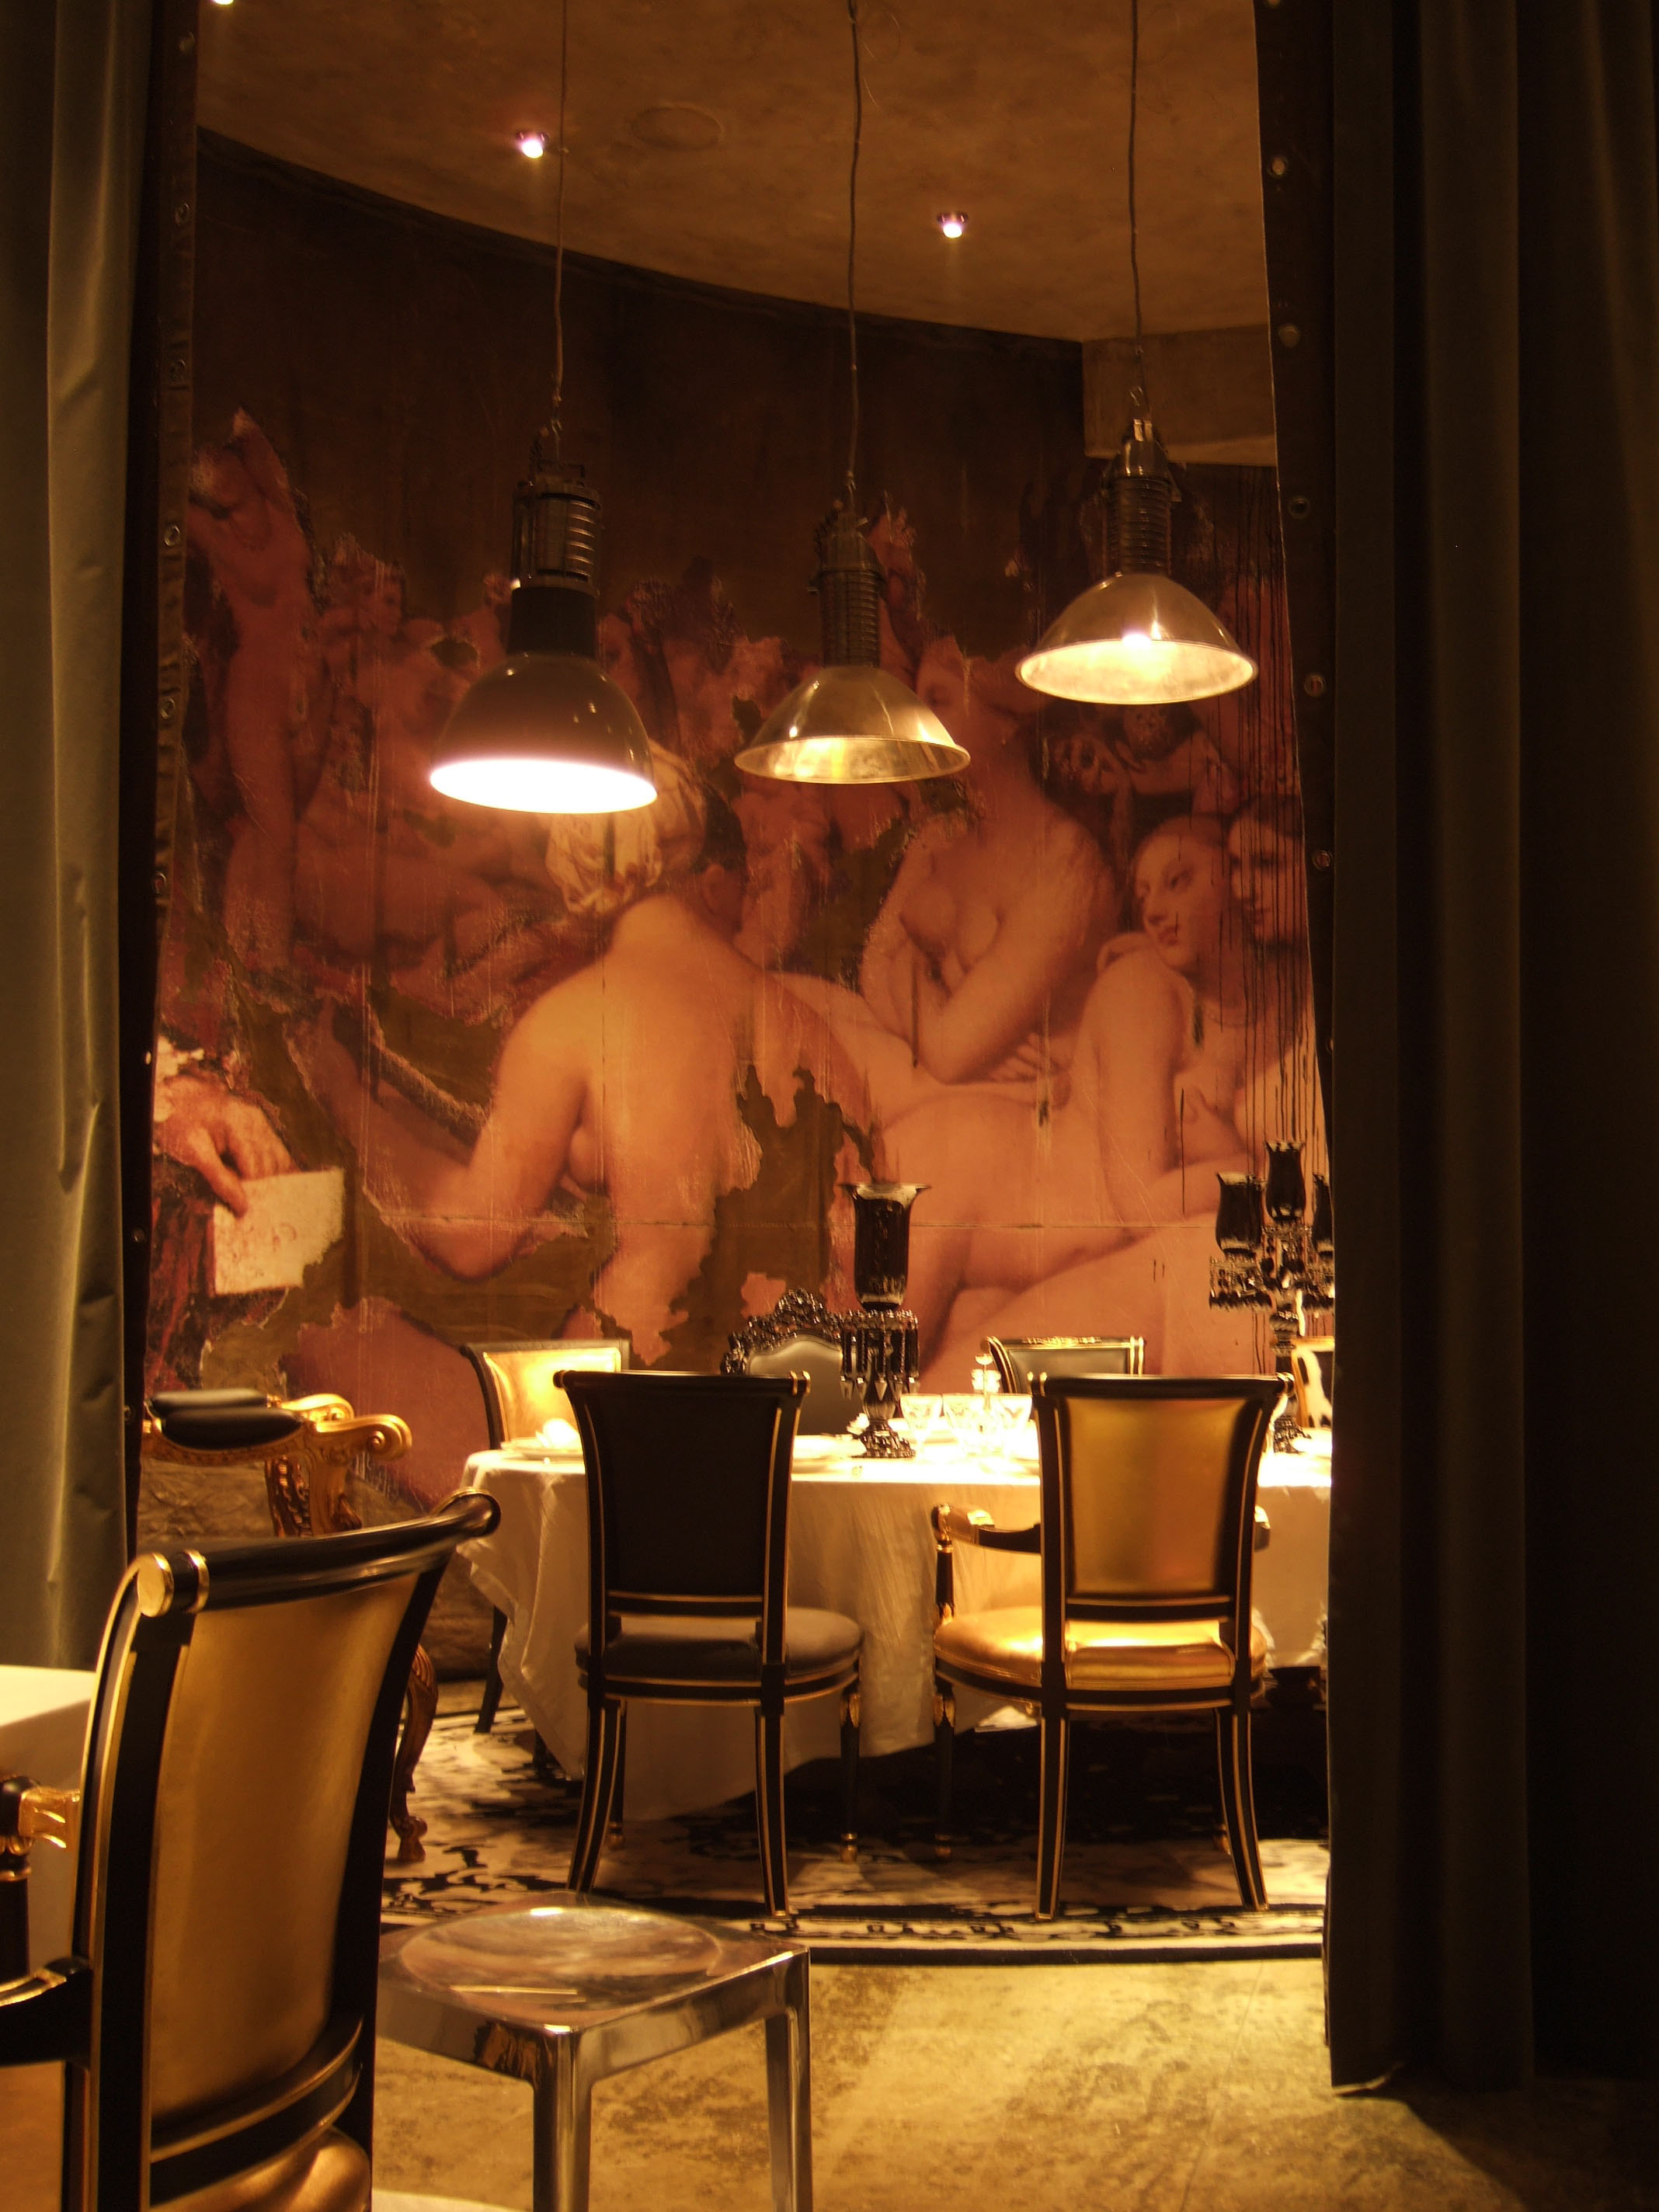 Bon Moscou / g. cenazandotti